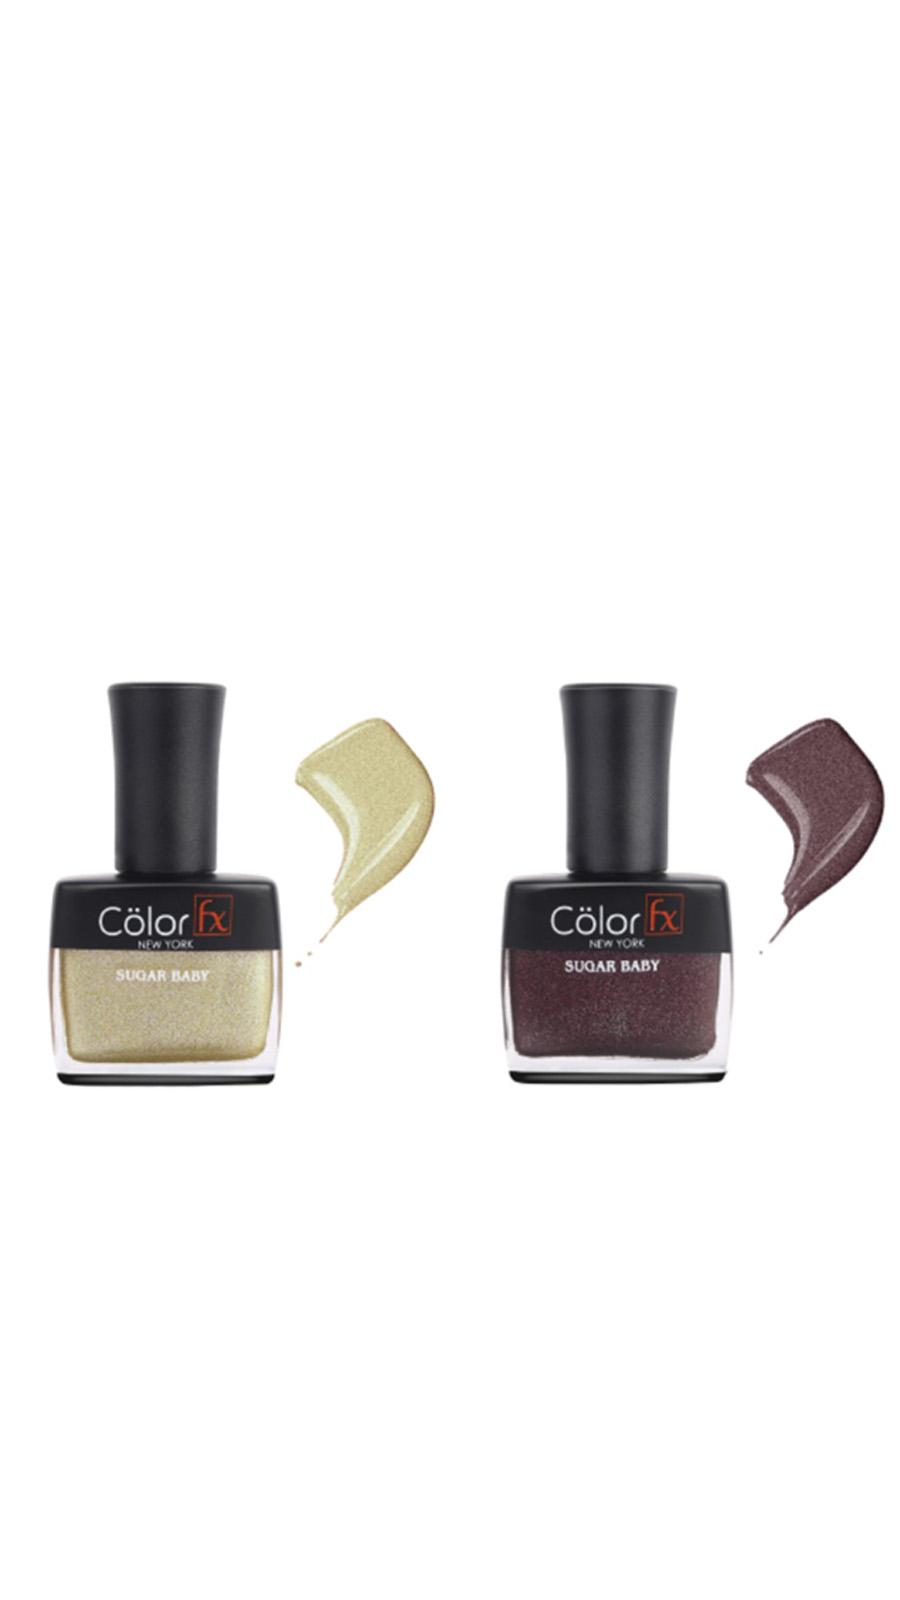 Color Fx | Color Fx Nail Enamel Sugar Baby - Wedding Collection Pack iof 2